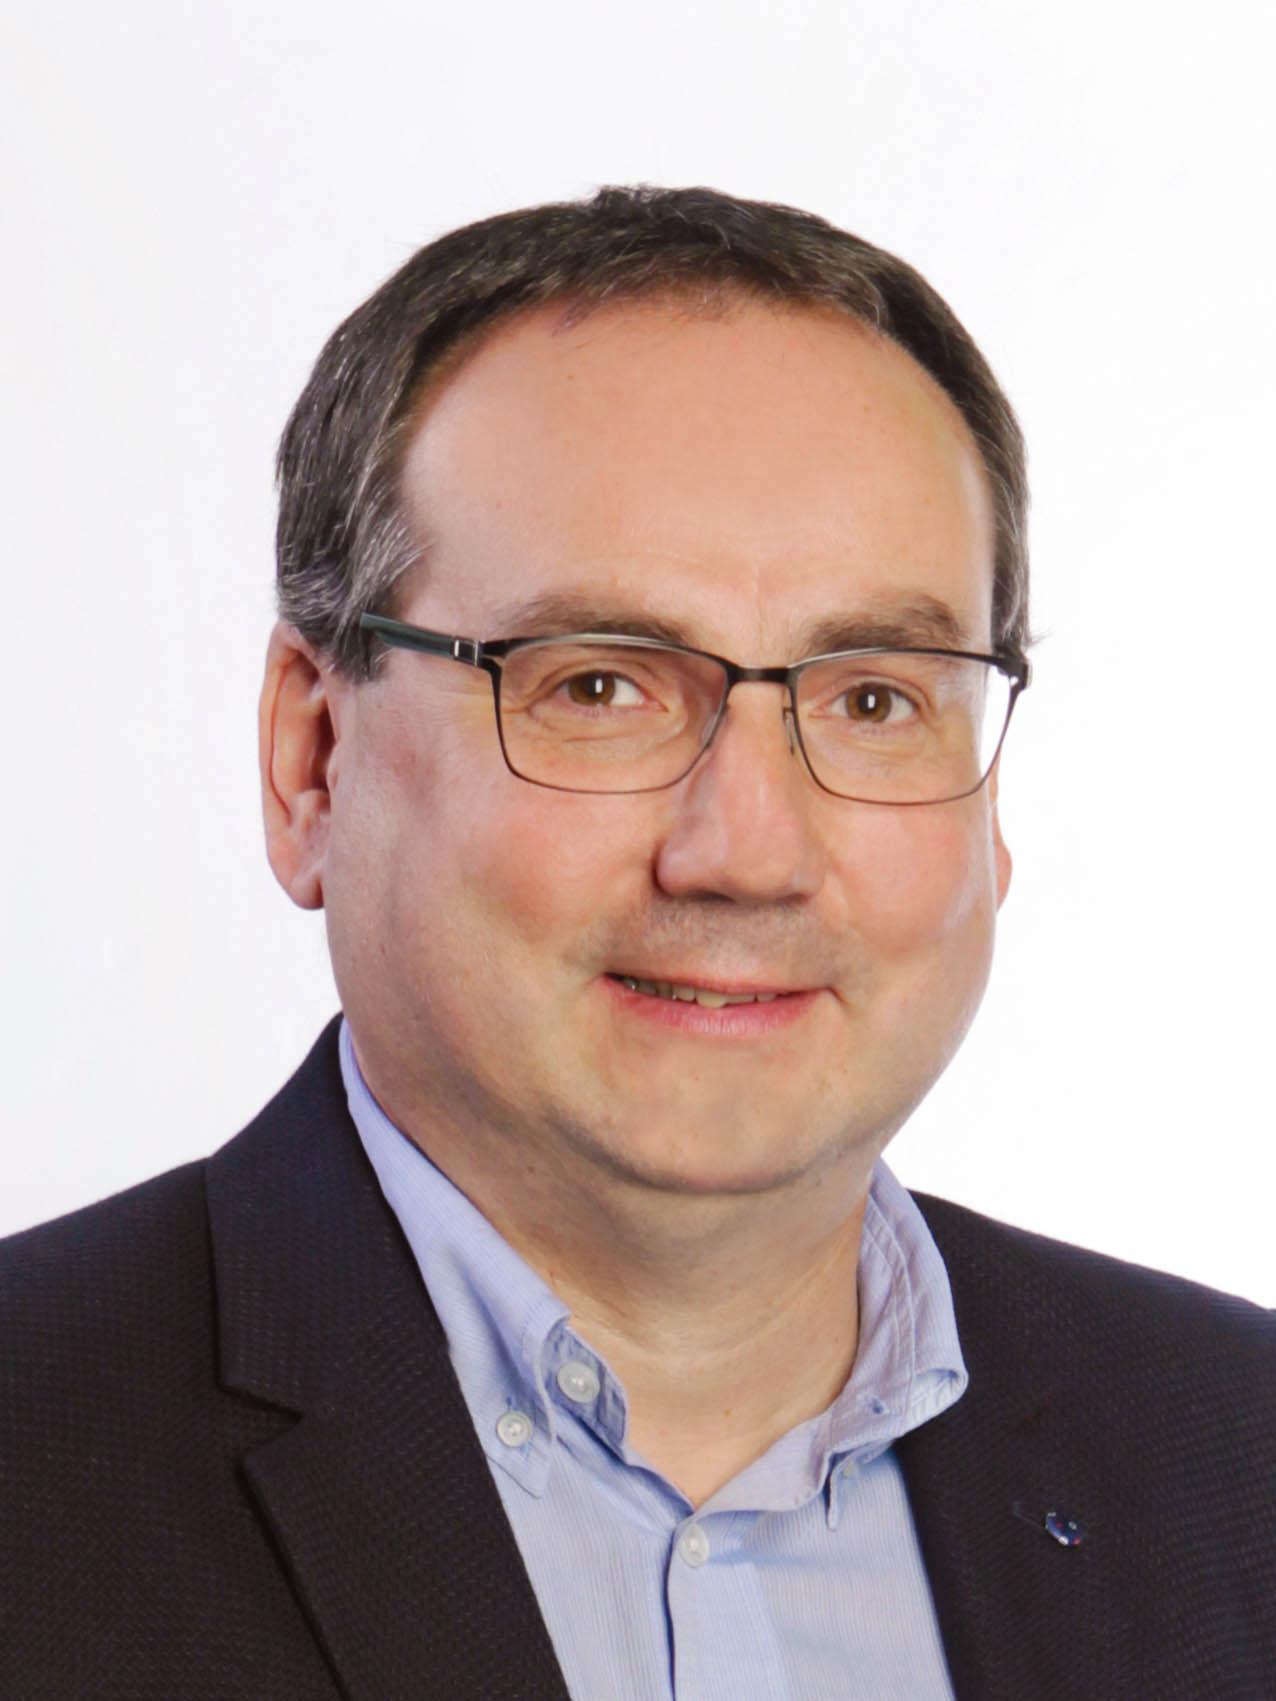 Petr Orálek, ředitel obchodu a marketingu, Economia